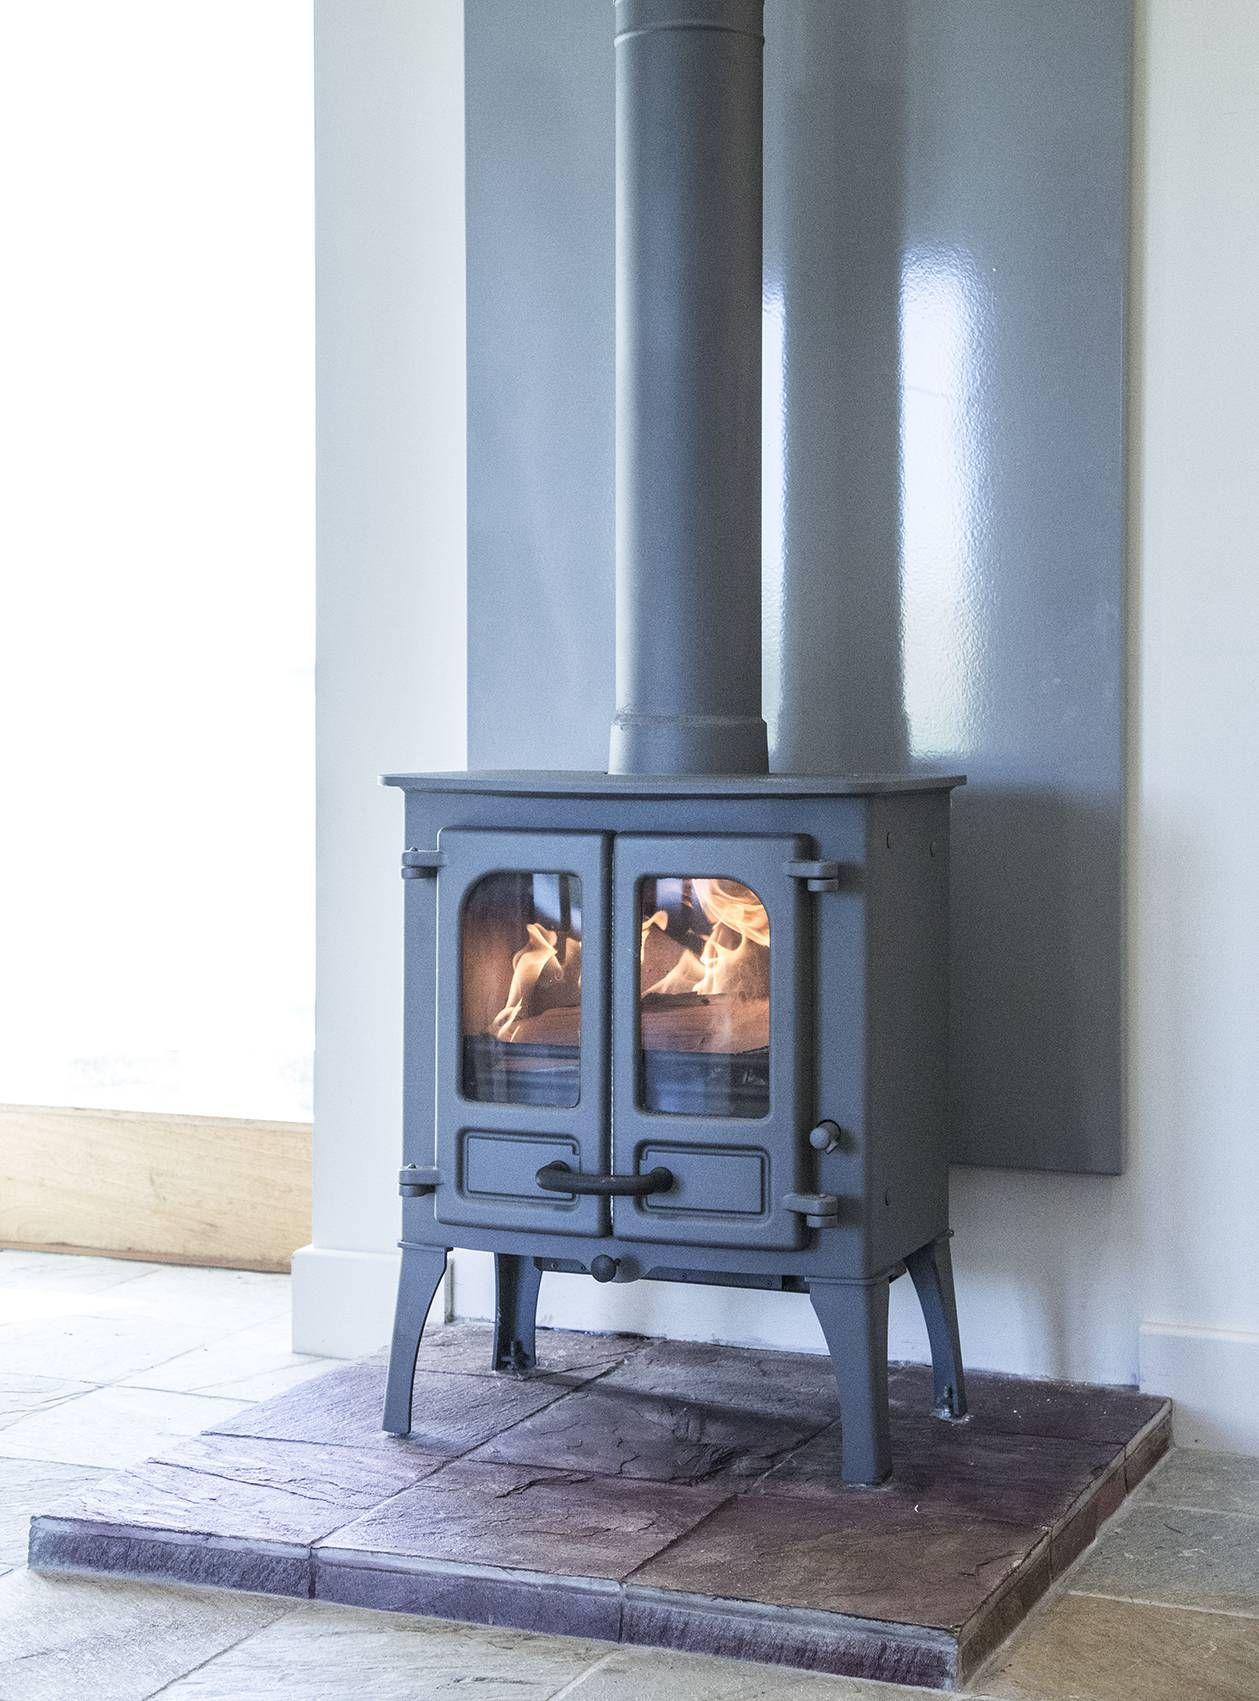 Island Stove With Vlaze Panel Wood Stove Freestanding Fireplace